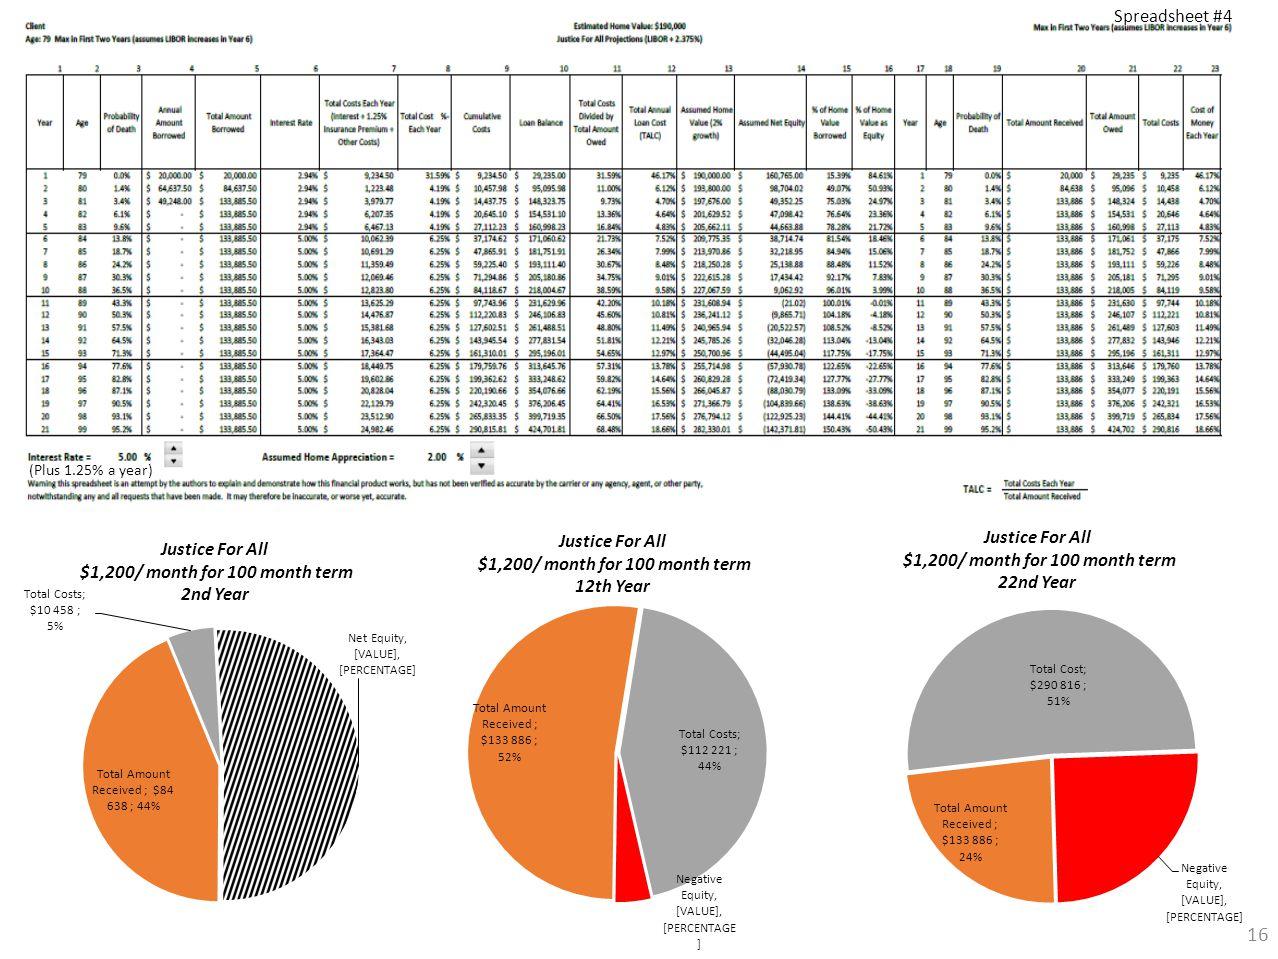 16 (Plus 1.25% a year) Spreadsheet #4